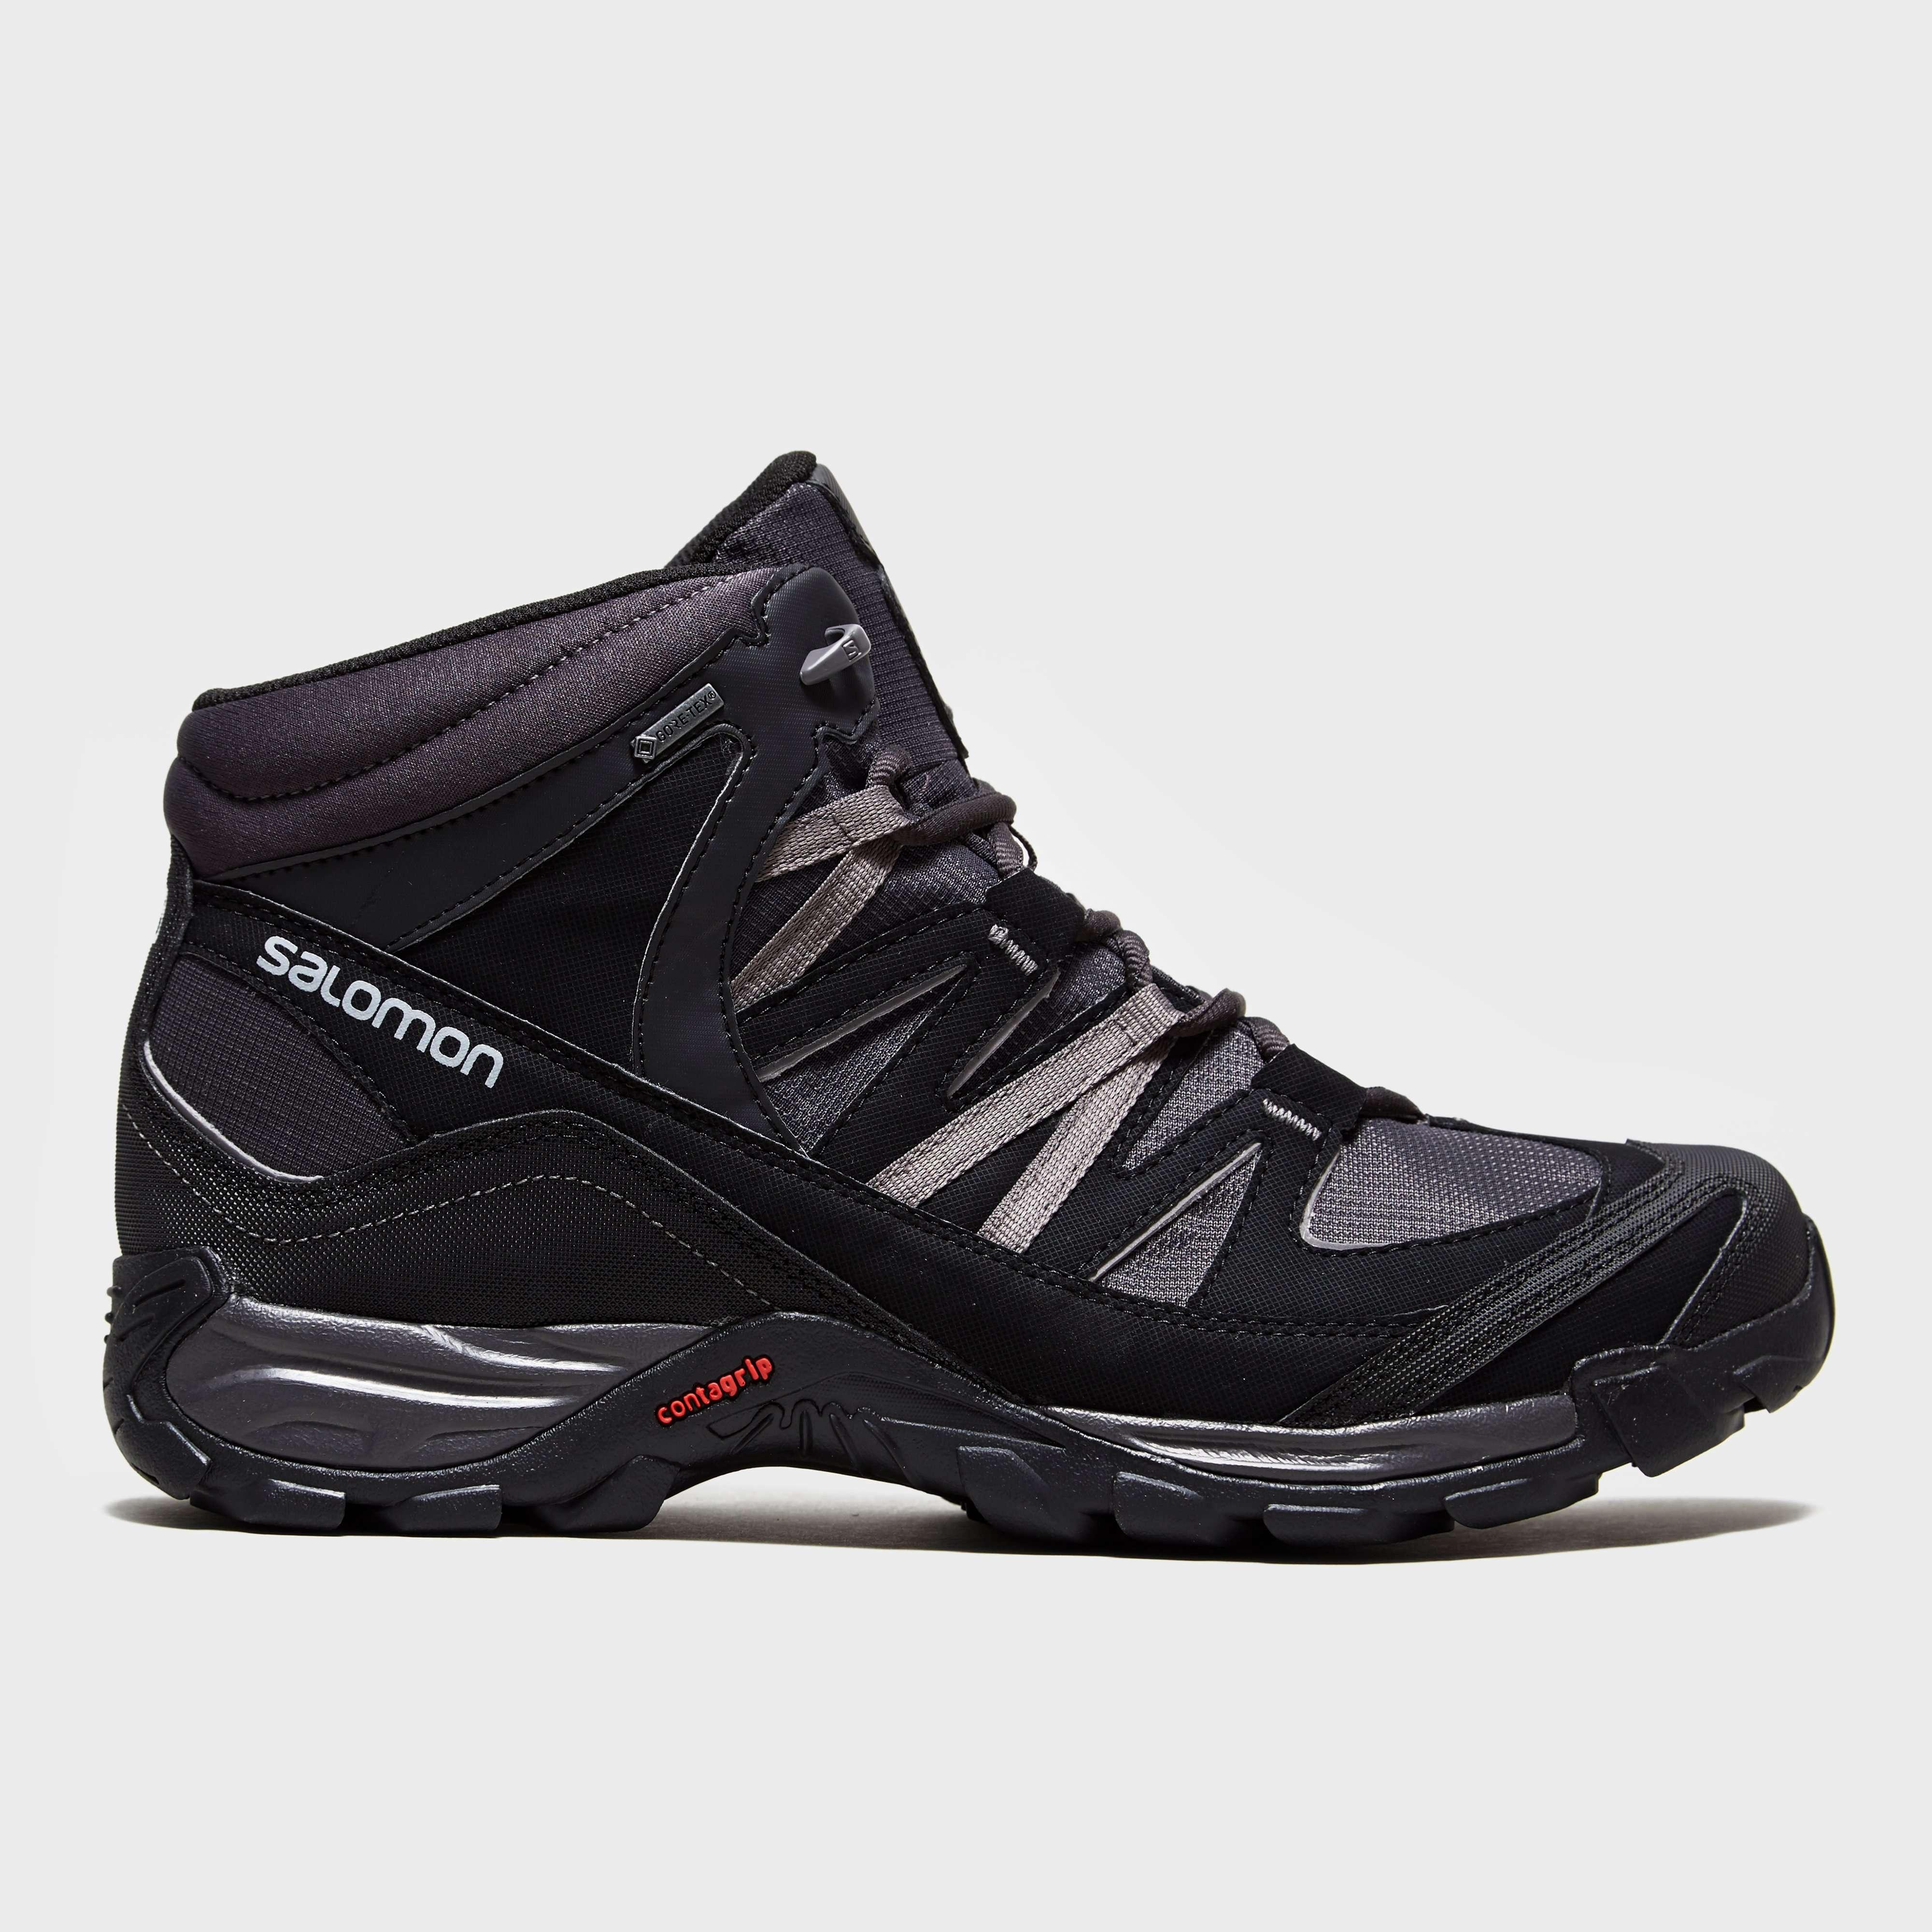 SALOMON Men's Mudstone GORE-TEX® Walking Boot